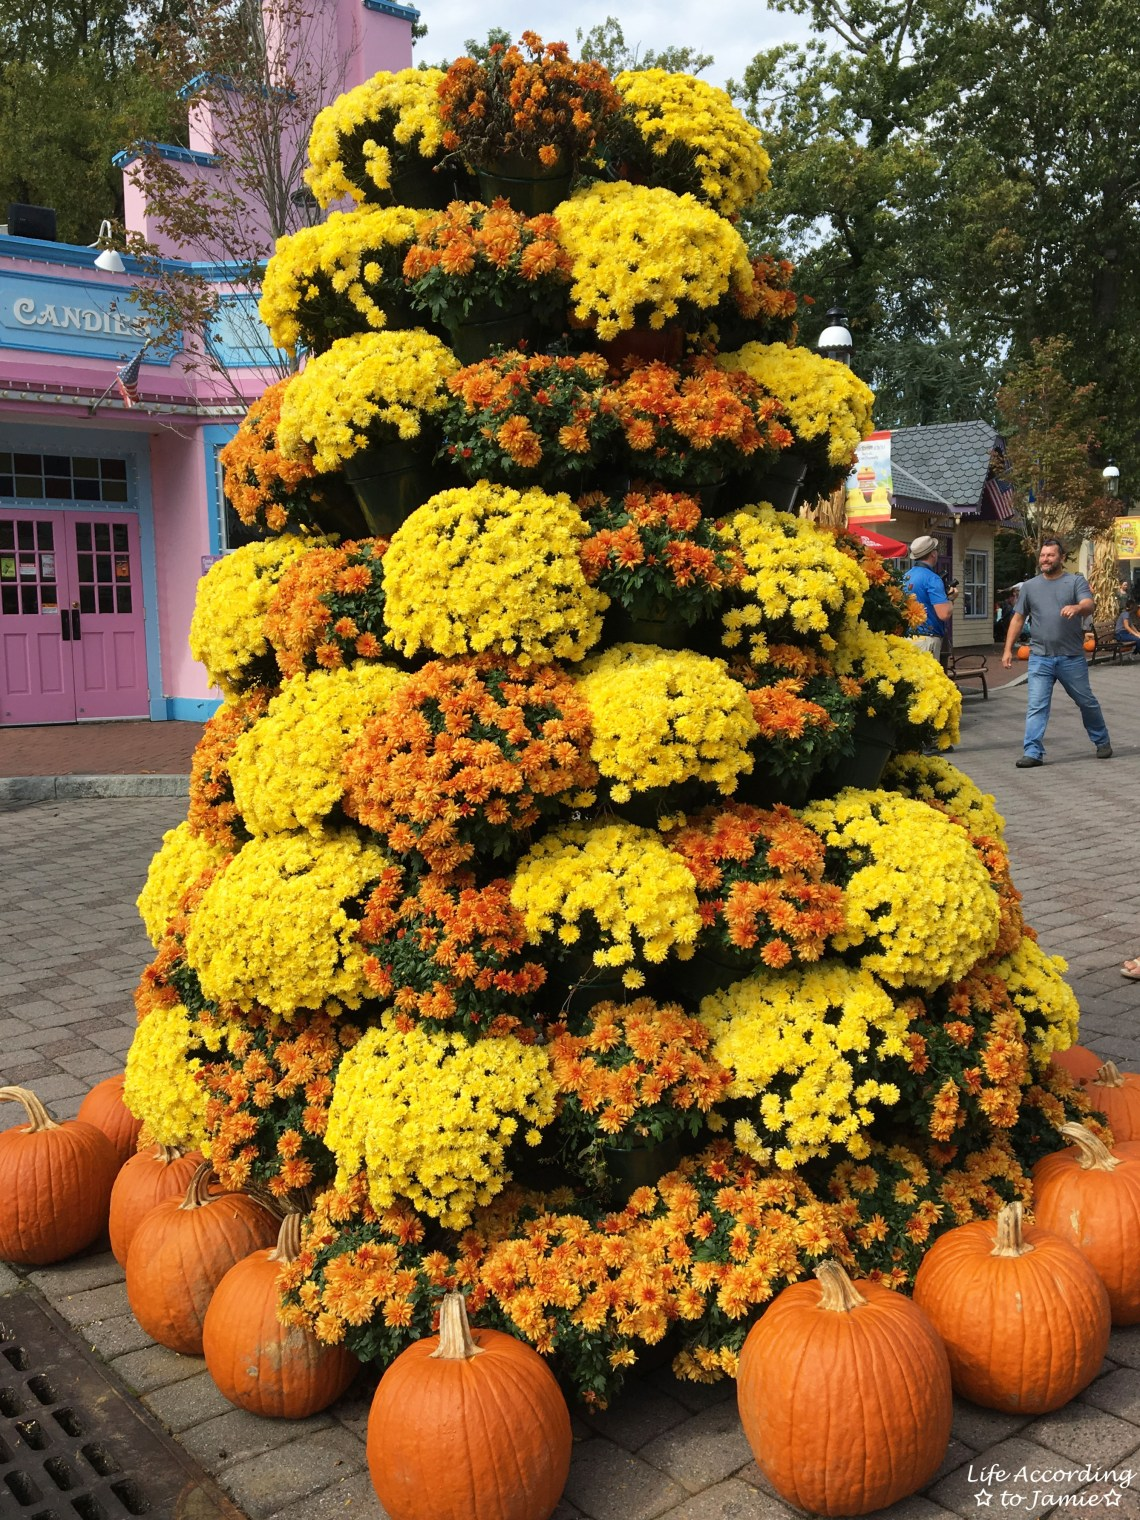 Six Flags Great Adventure - Halloween Decorations